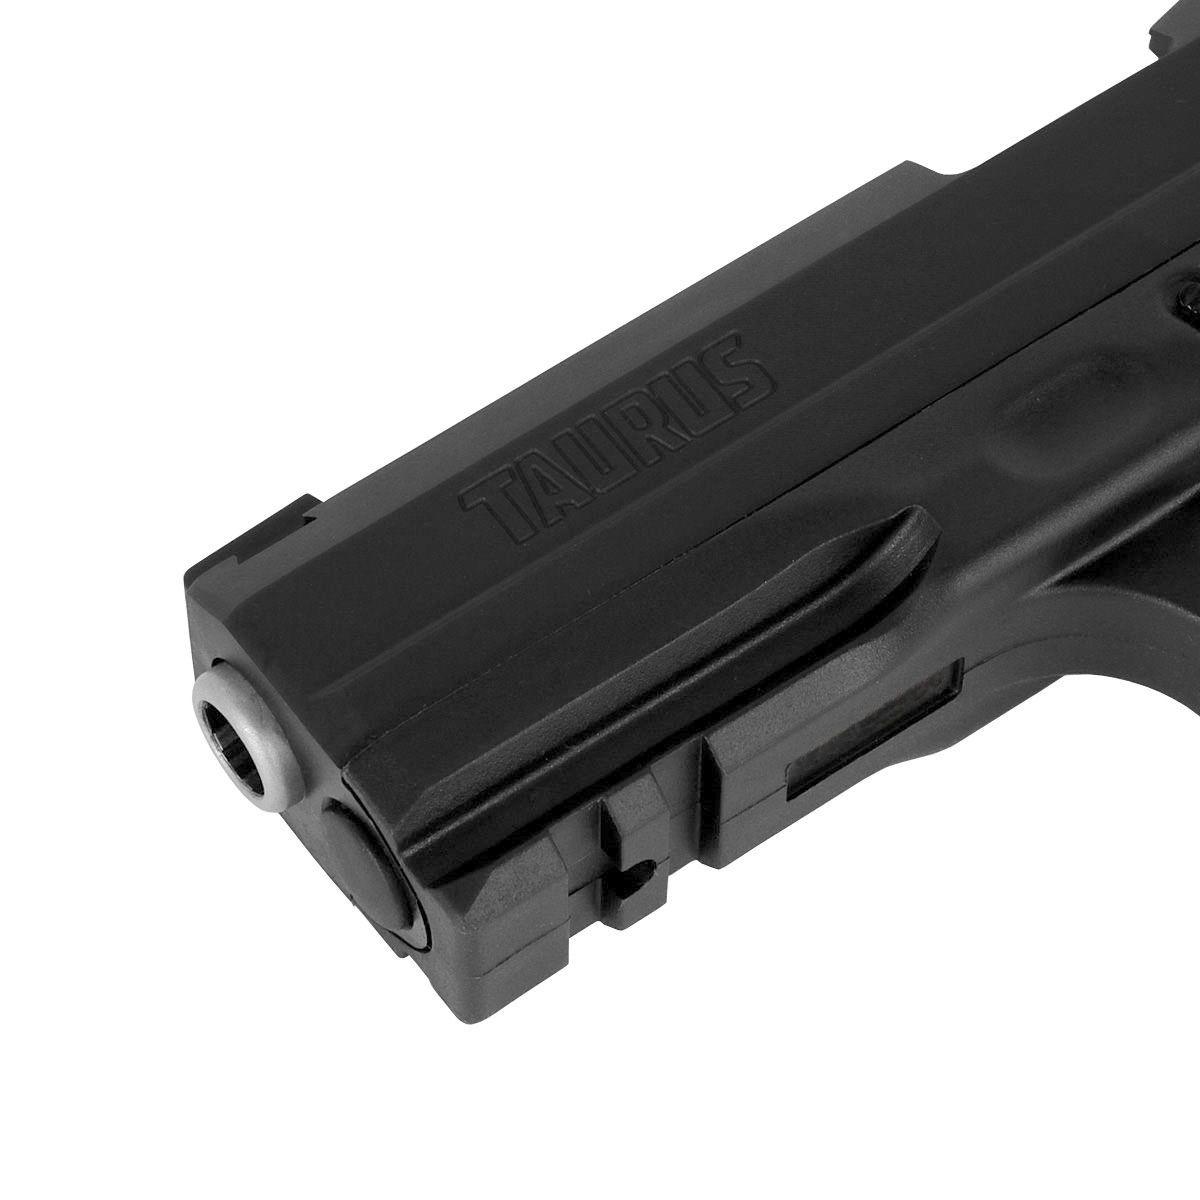 Pistola Taurus TH380 - Cal. 380 ACP 18+1 Tiros Oxidada